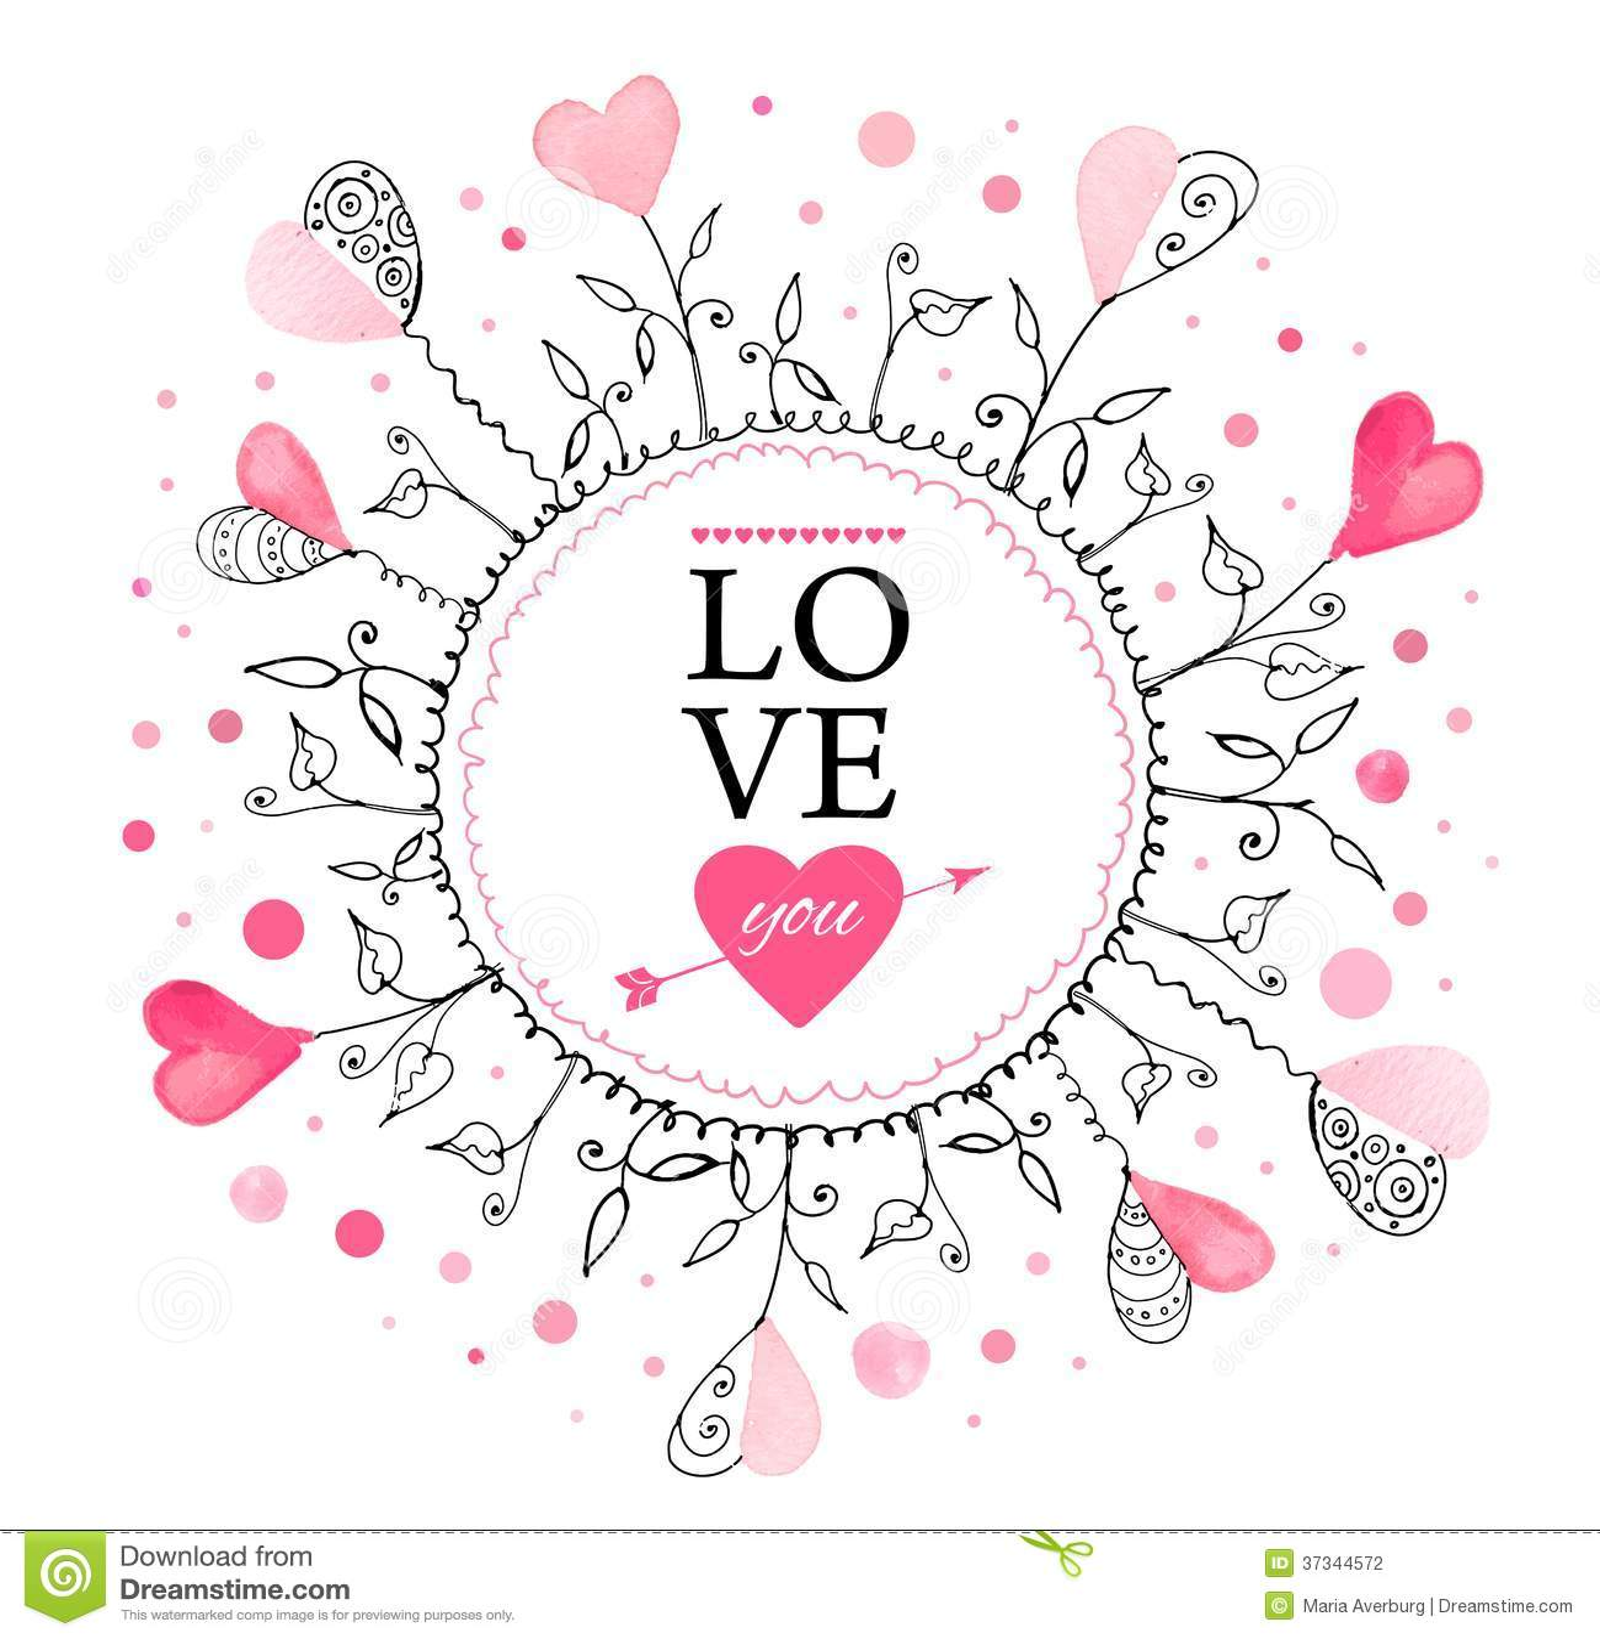 Postkarte für Valentinstag